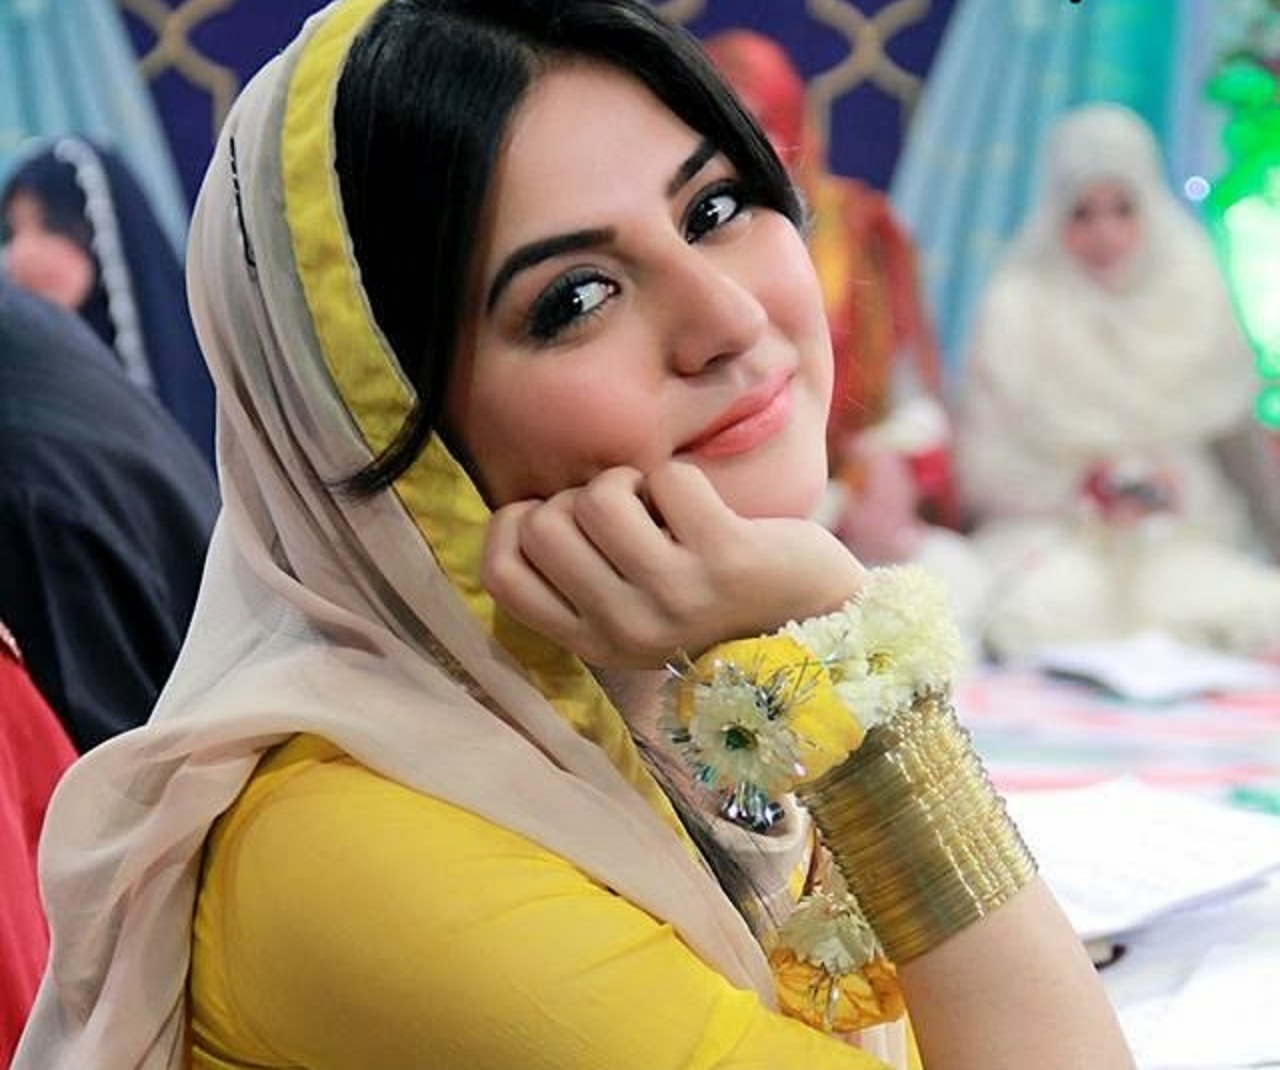 Cute Girl Hd Wallpapers 1080p Sanam Baloch Images Hd Wallpaper All 4u Wallpaper